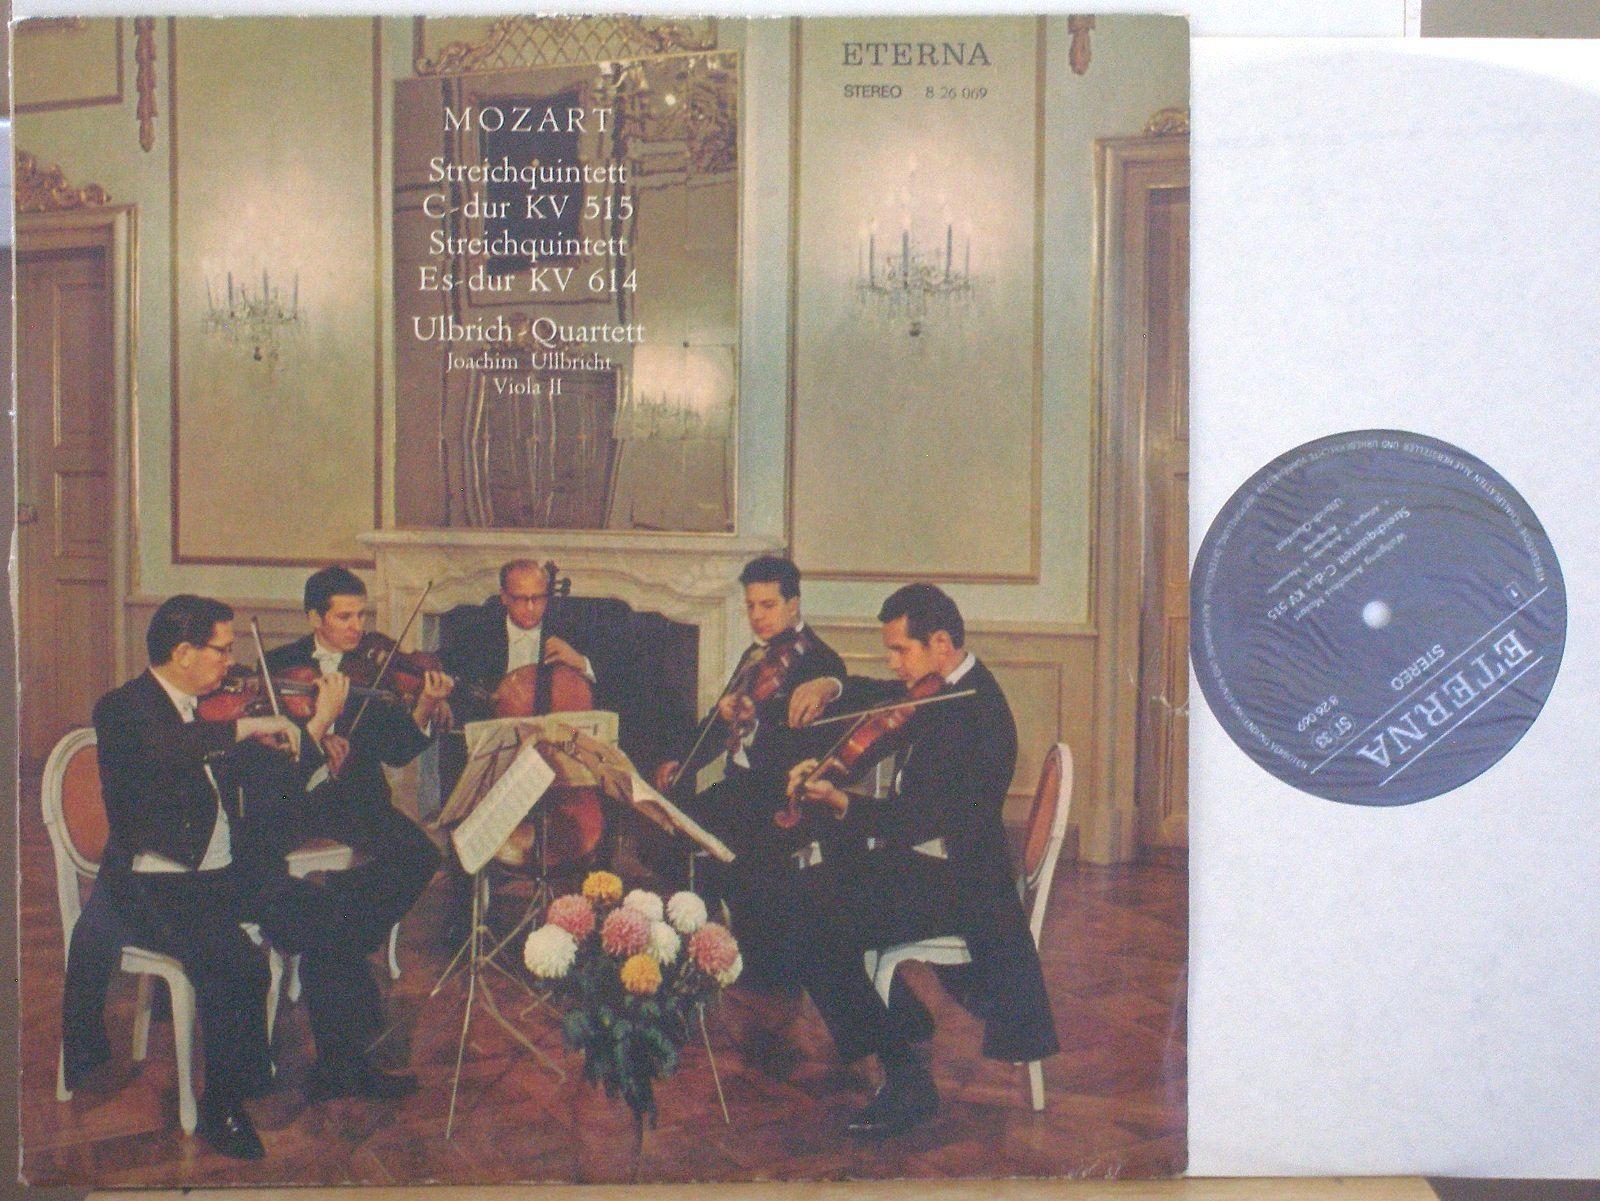 ULBRICH-QUARTETT Mozart String Quintett KV515/614 ETERNA 826069 STEREO ED1